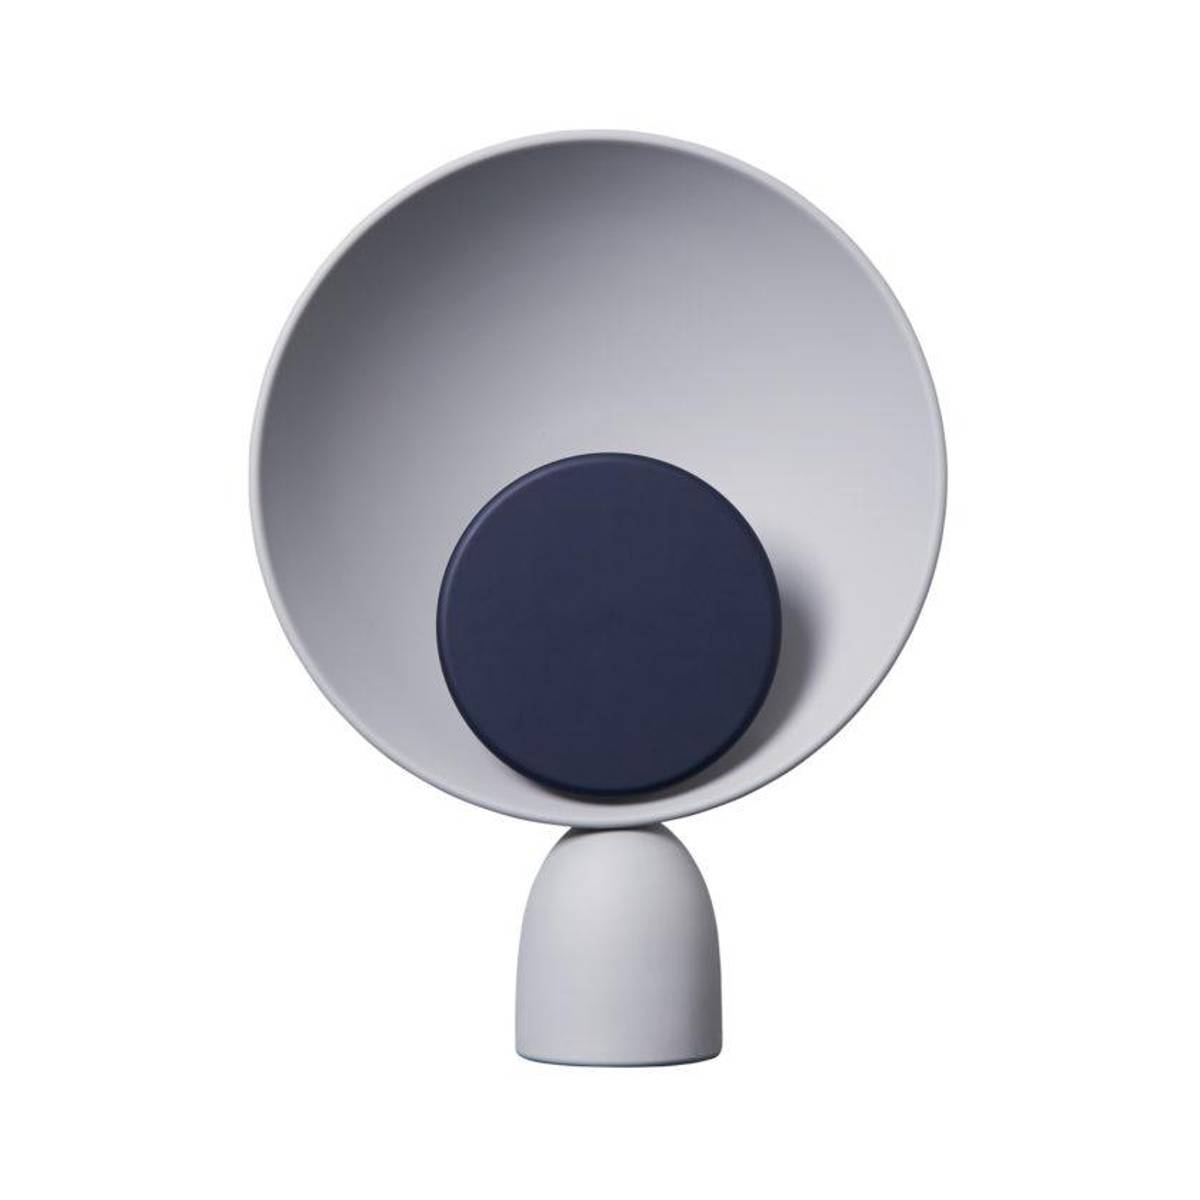 Blooper Bordlampe Navy Blue, PWtbS